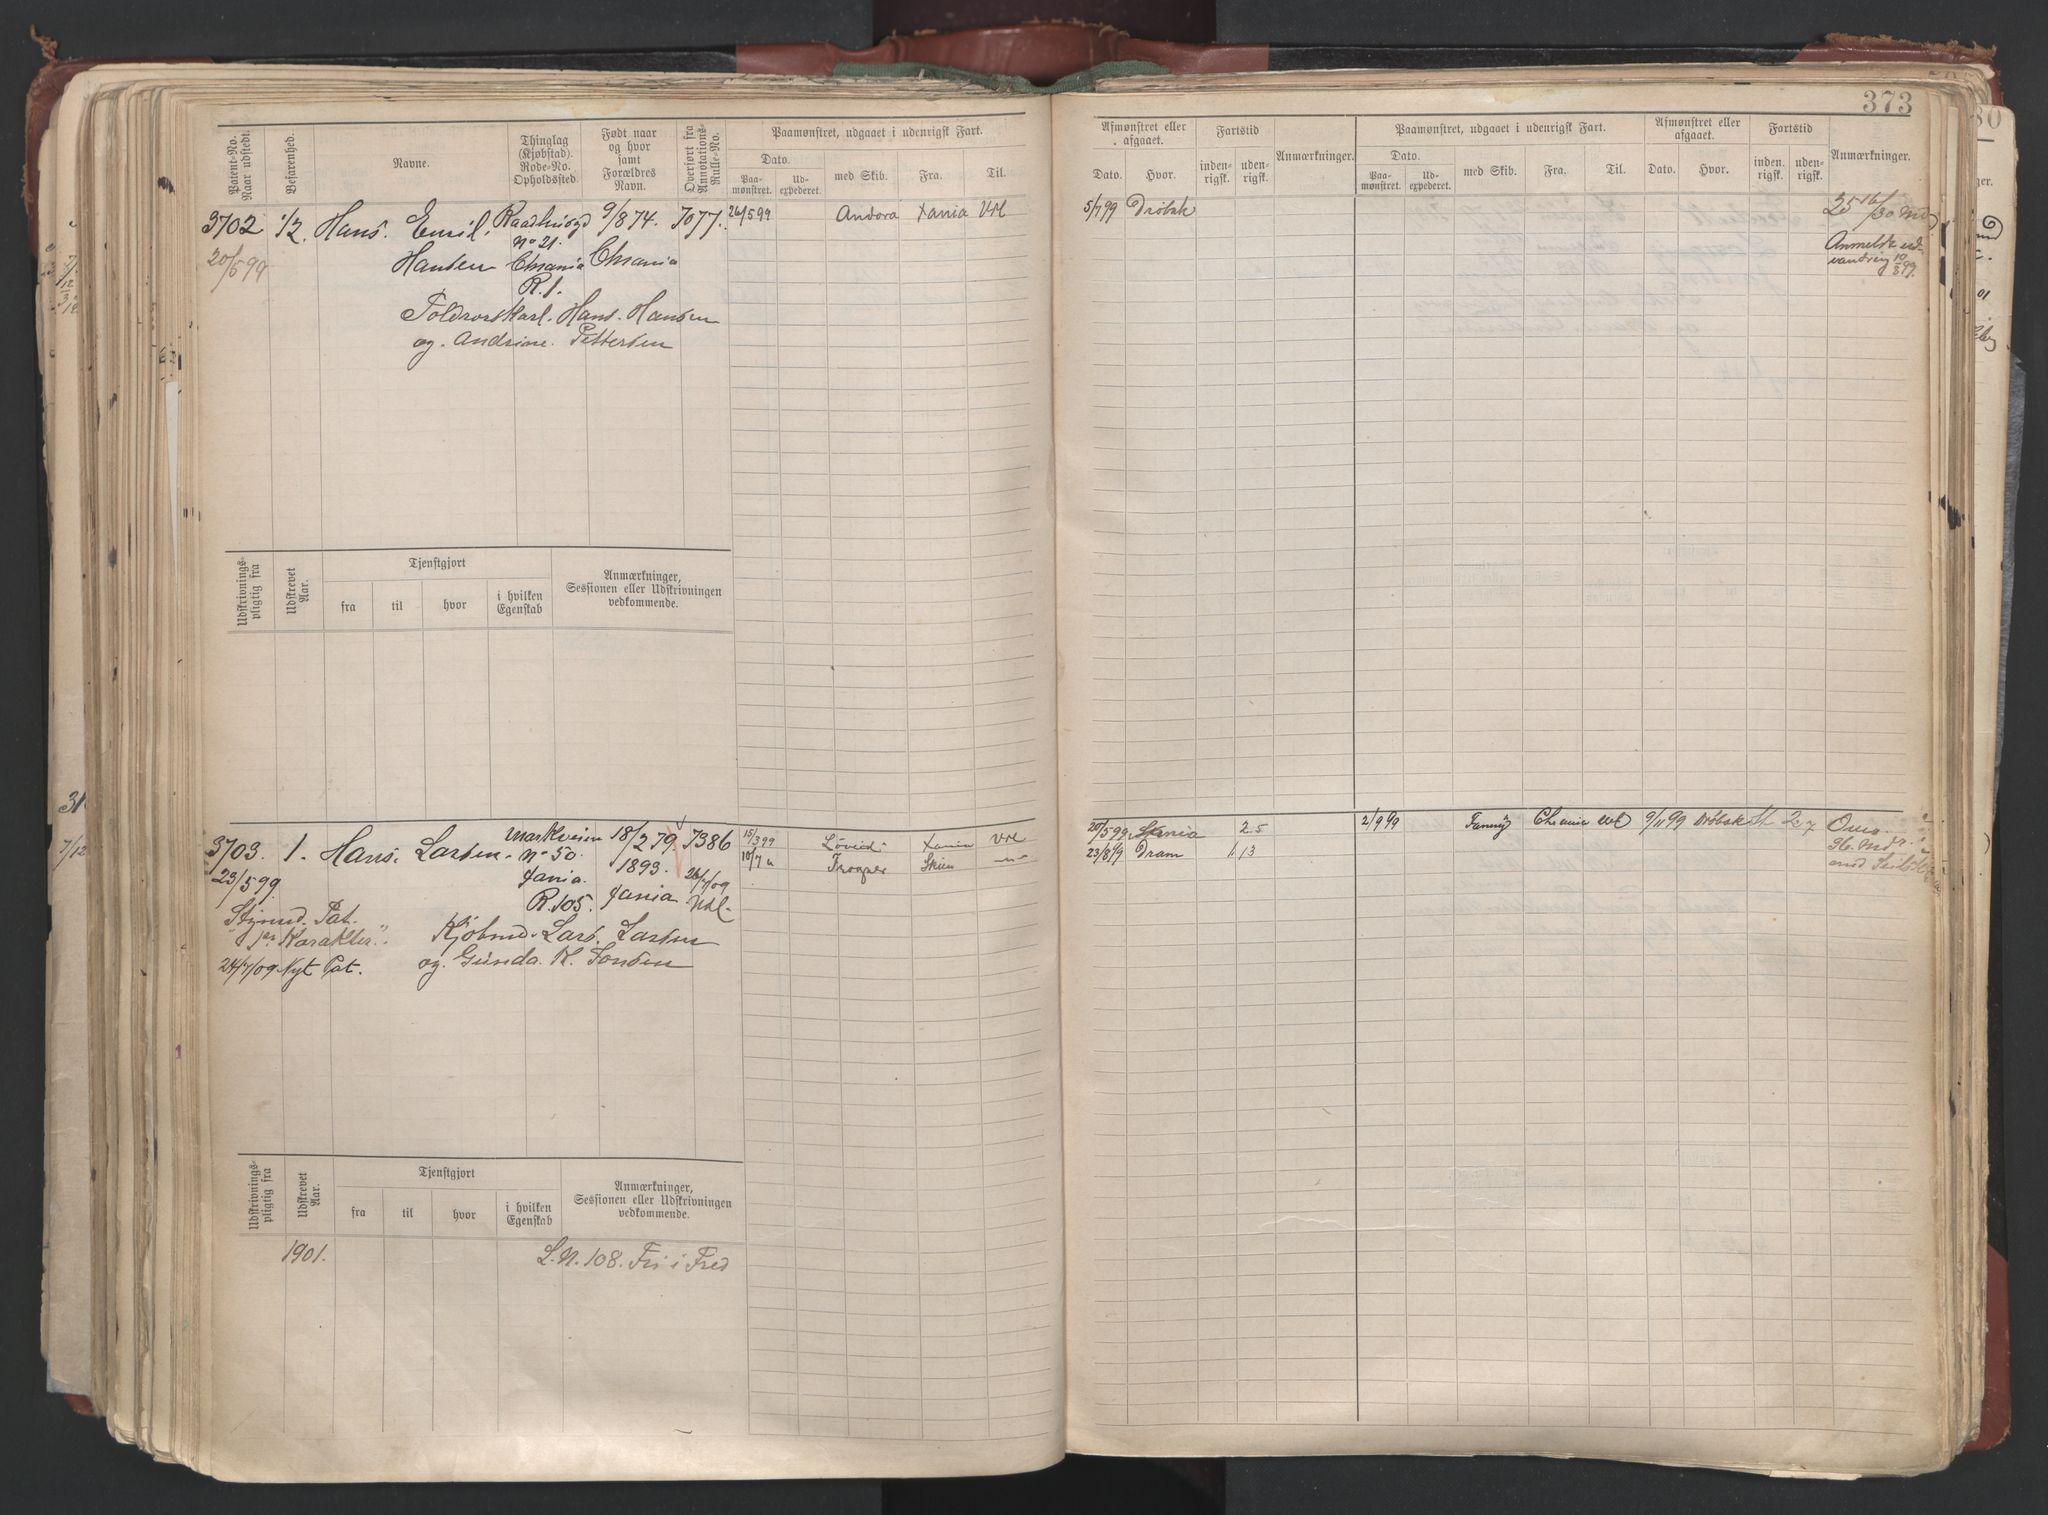 SAO, Oslo sjømannskontor, F/Fc/L0003: Hovedrulle, 1893, s. 372b-373a